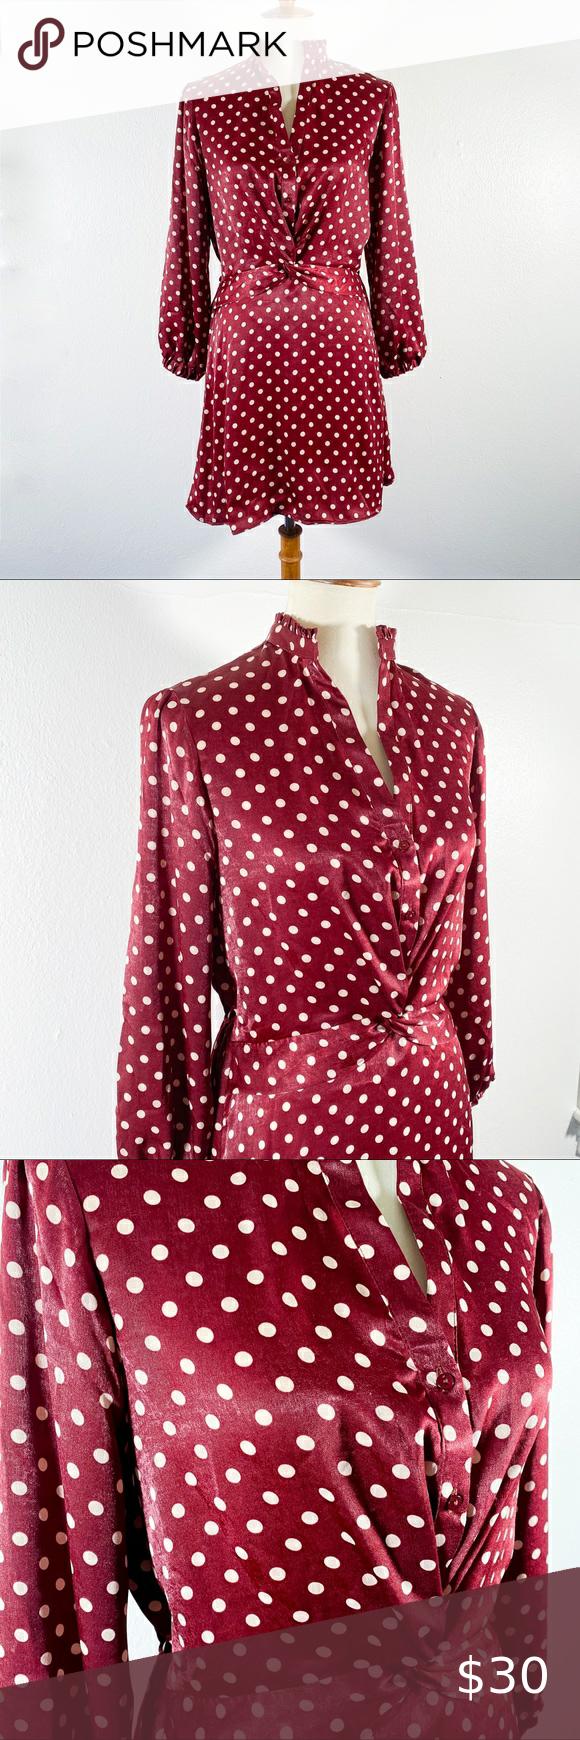 Silky Polka Dot Zara Dress Zara Dresses Dresses Dot Dress [ 1740 x 580 Pixel ]